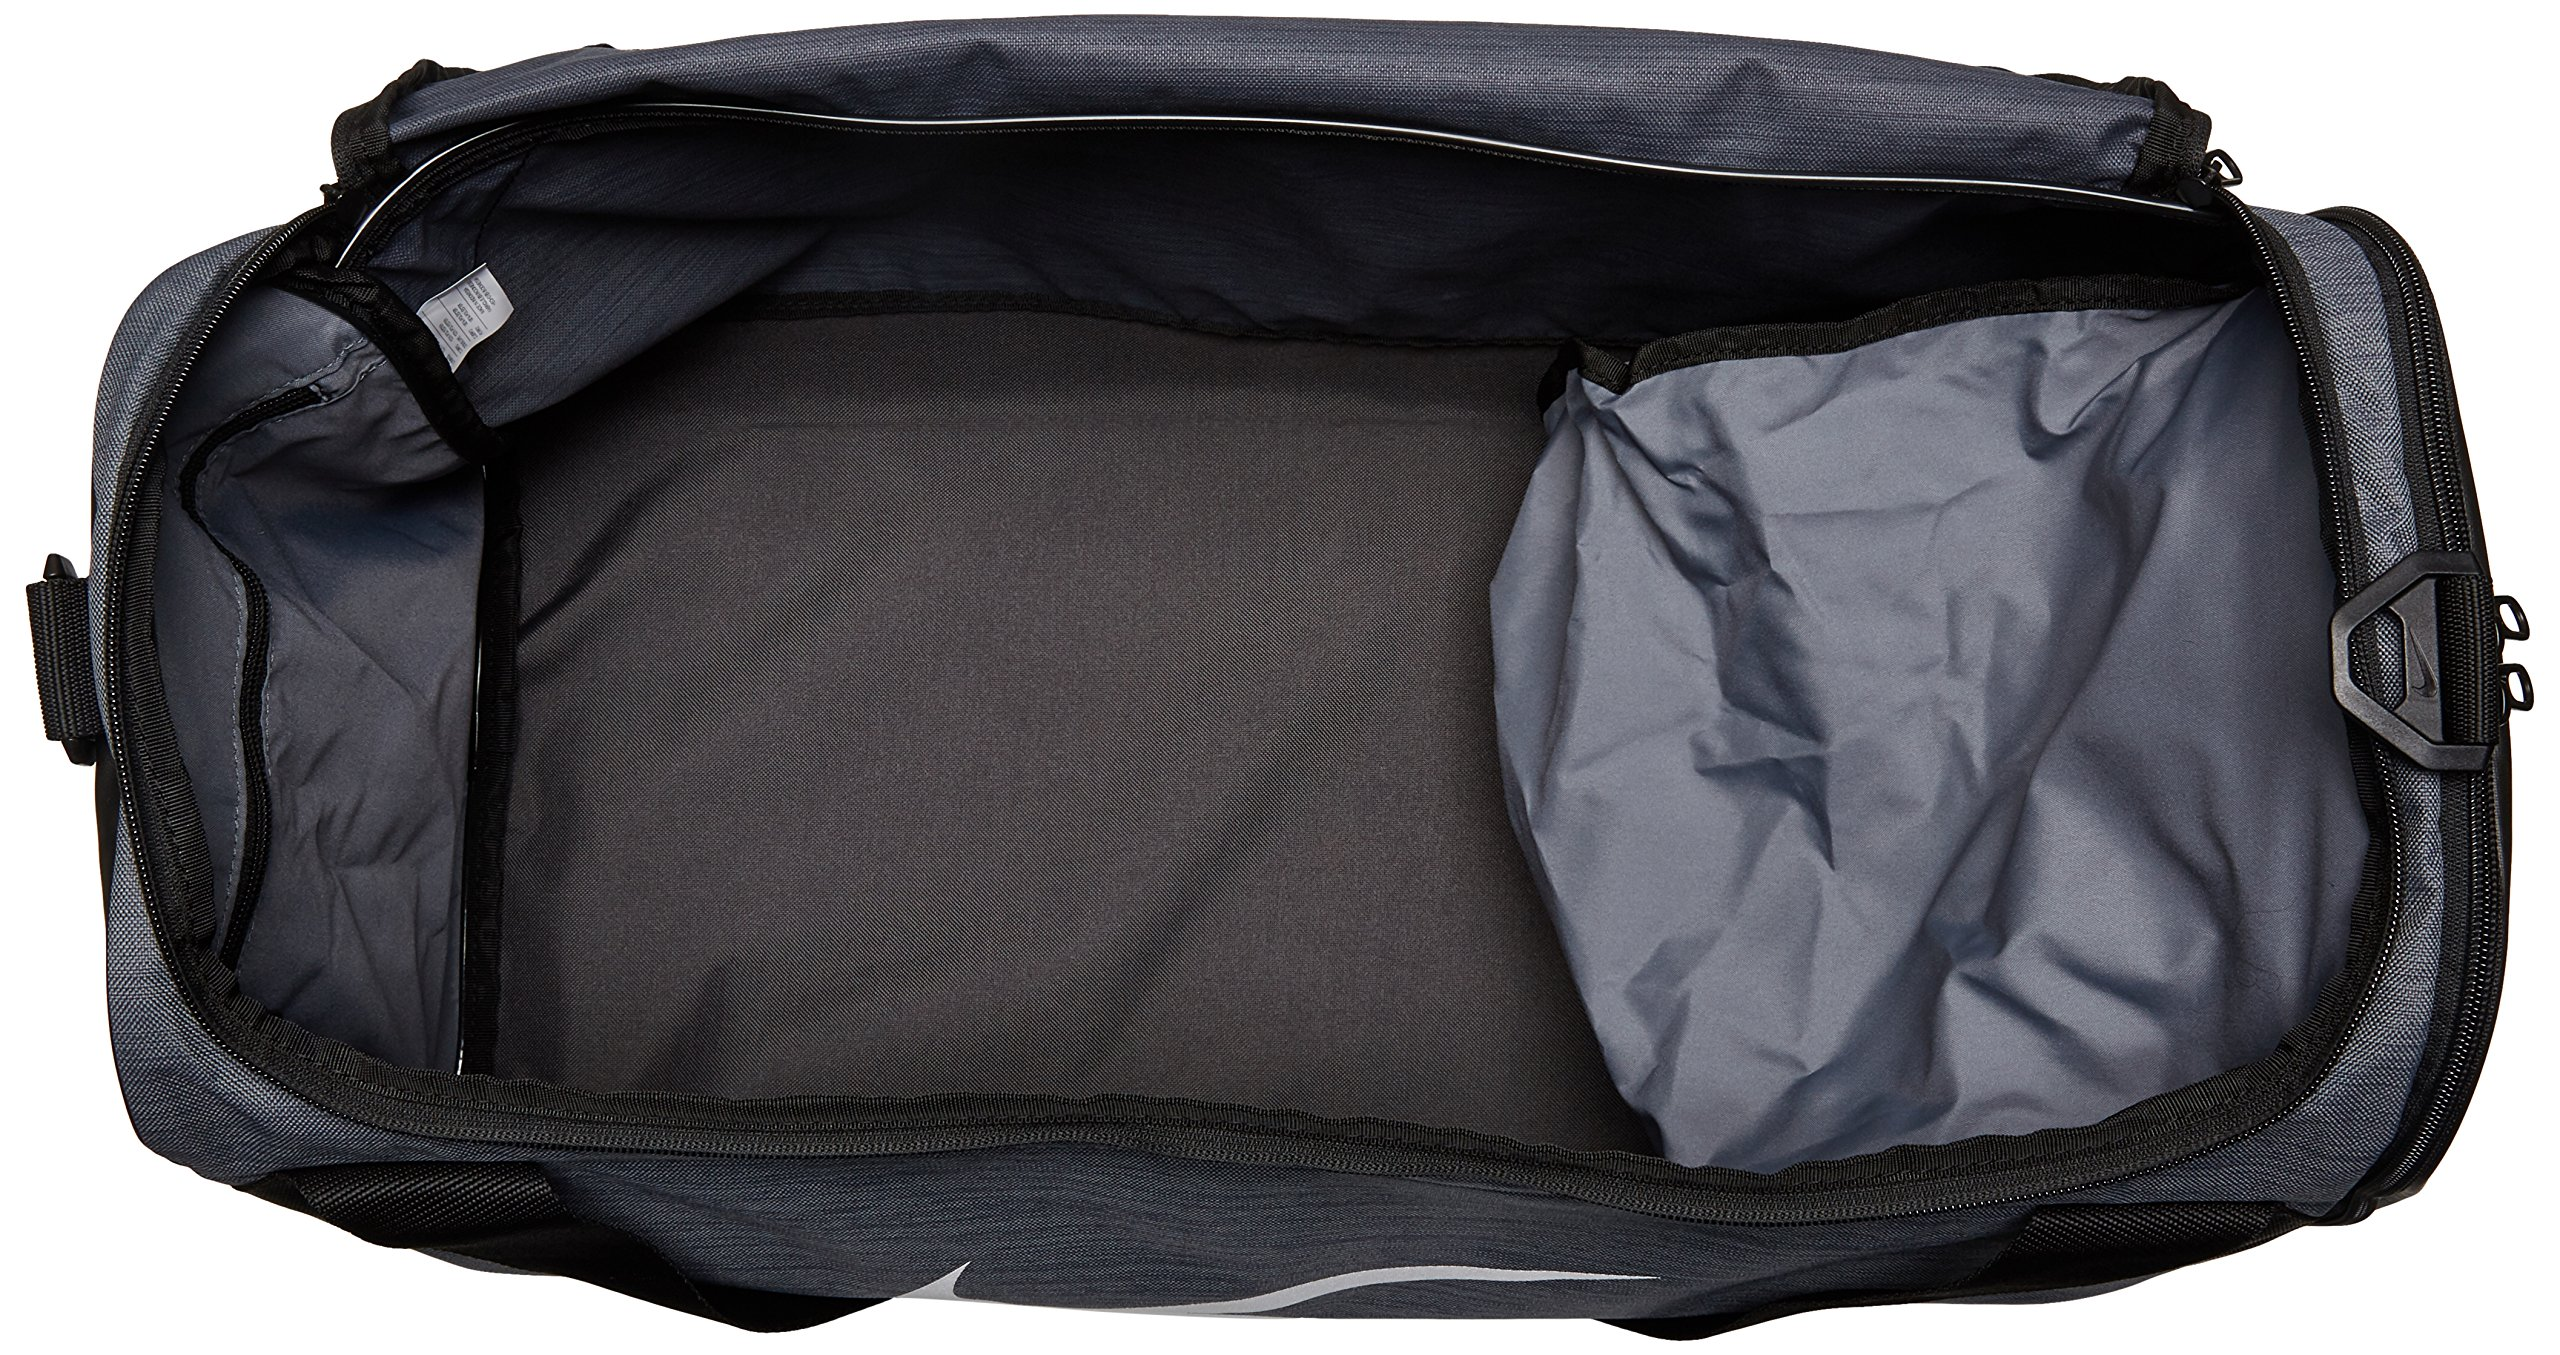 Nike Brasilia (Small) Training Duffel Bag Flint Grey/Black/White Size Small